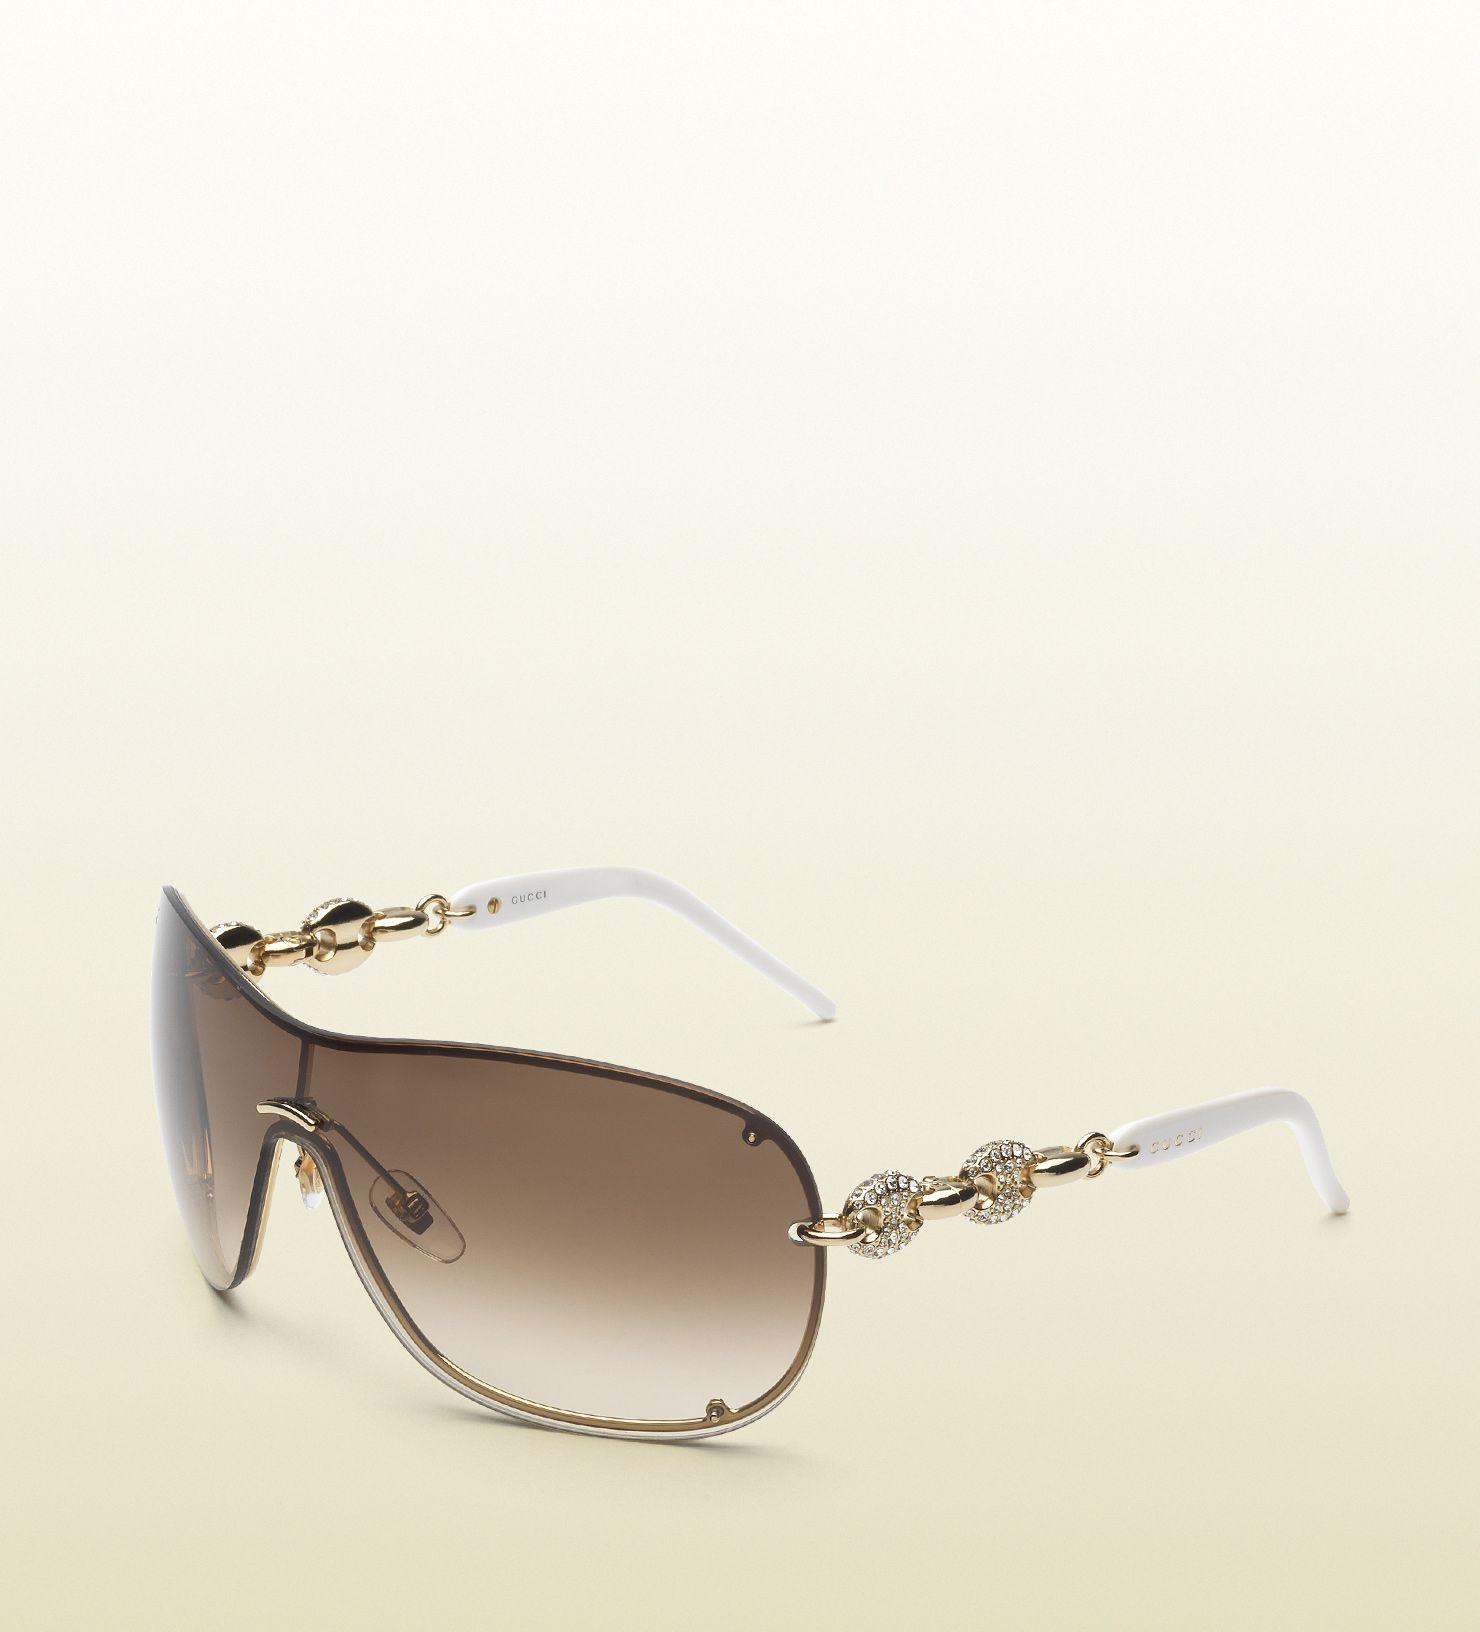 With DetailLunettes Sunglasses Strass Swarovski Mask wPX08Onk